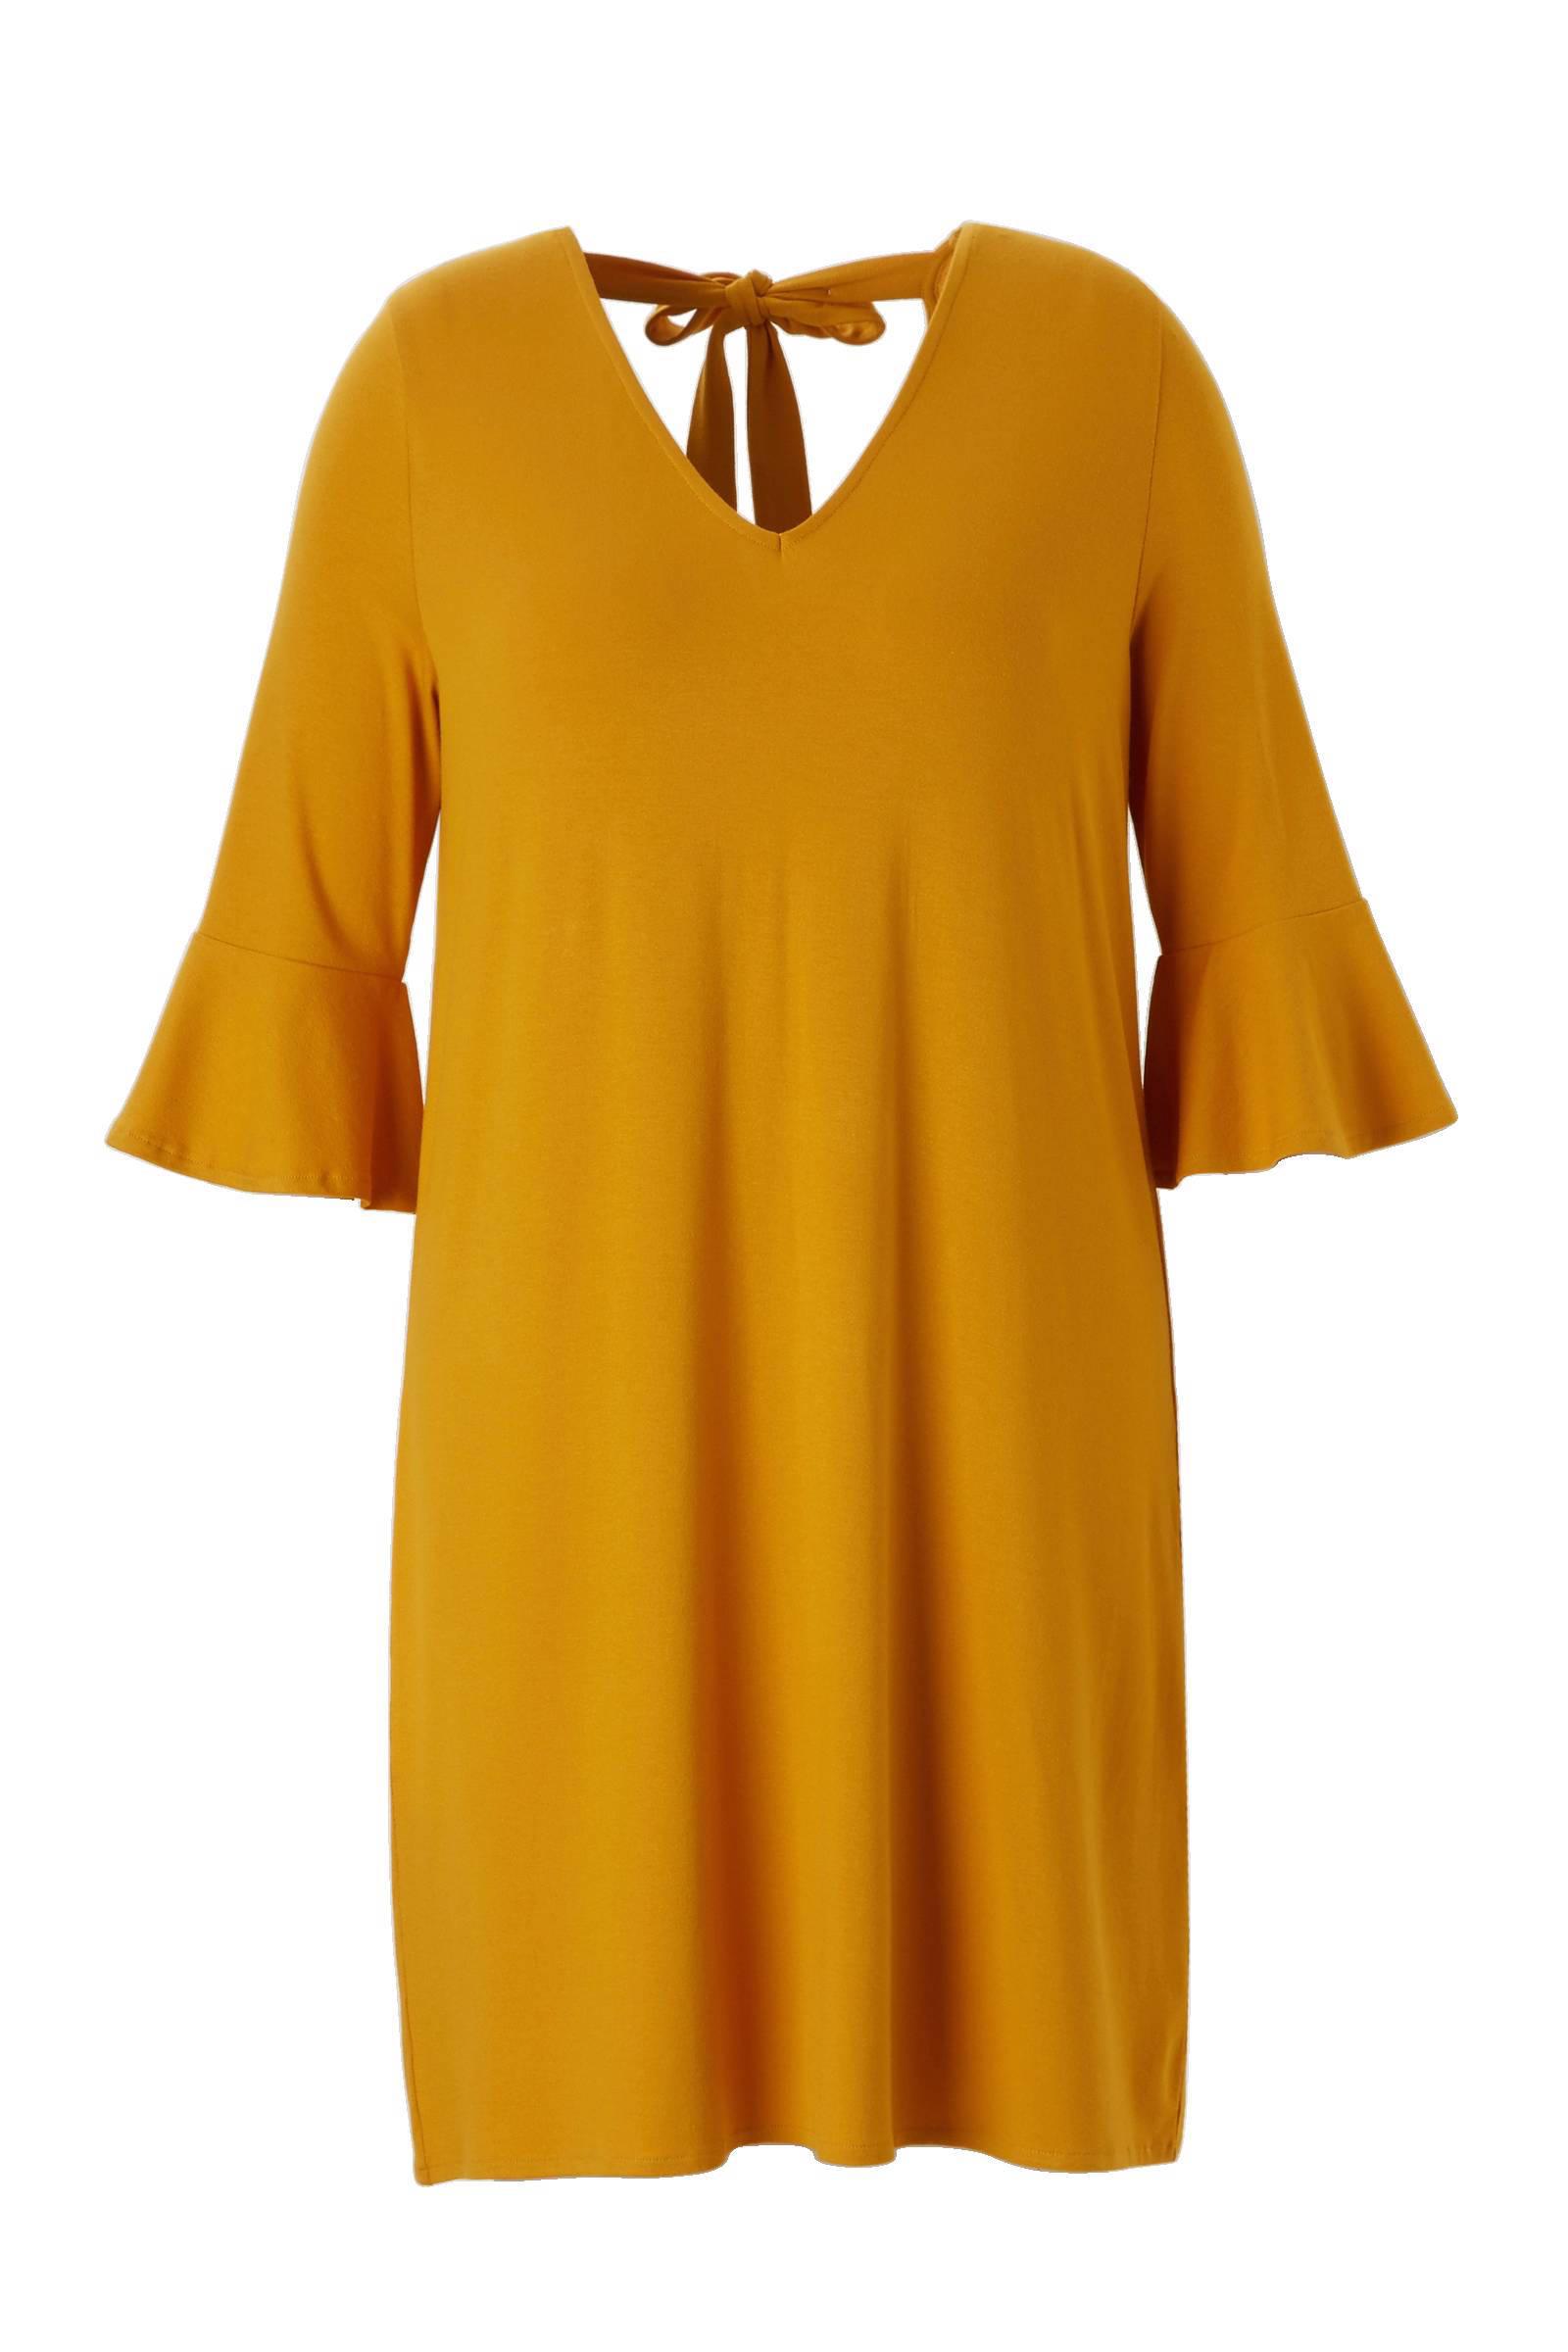 whkmp's great looks jurk met v-hals